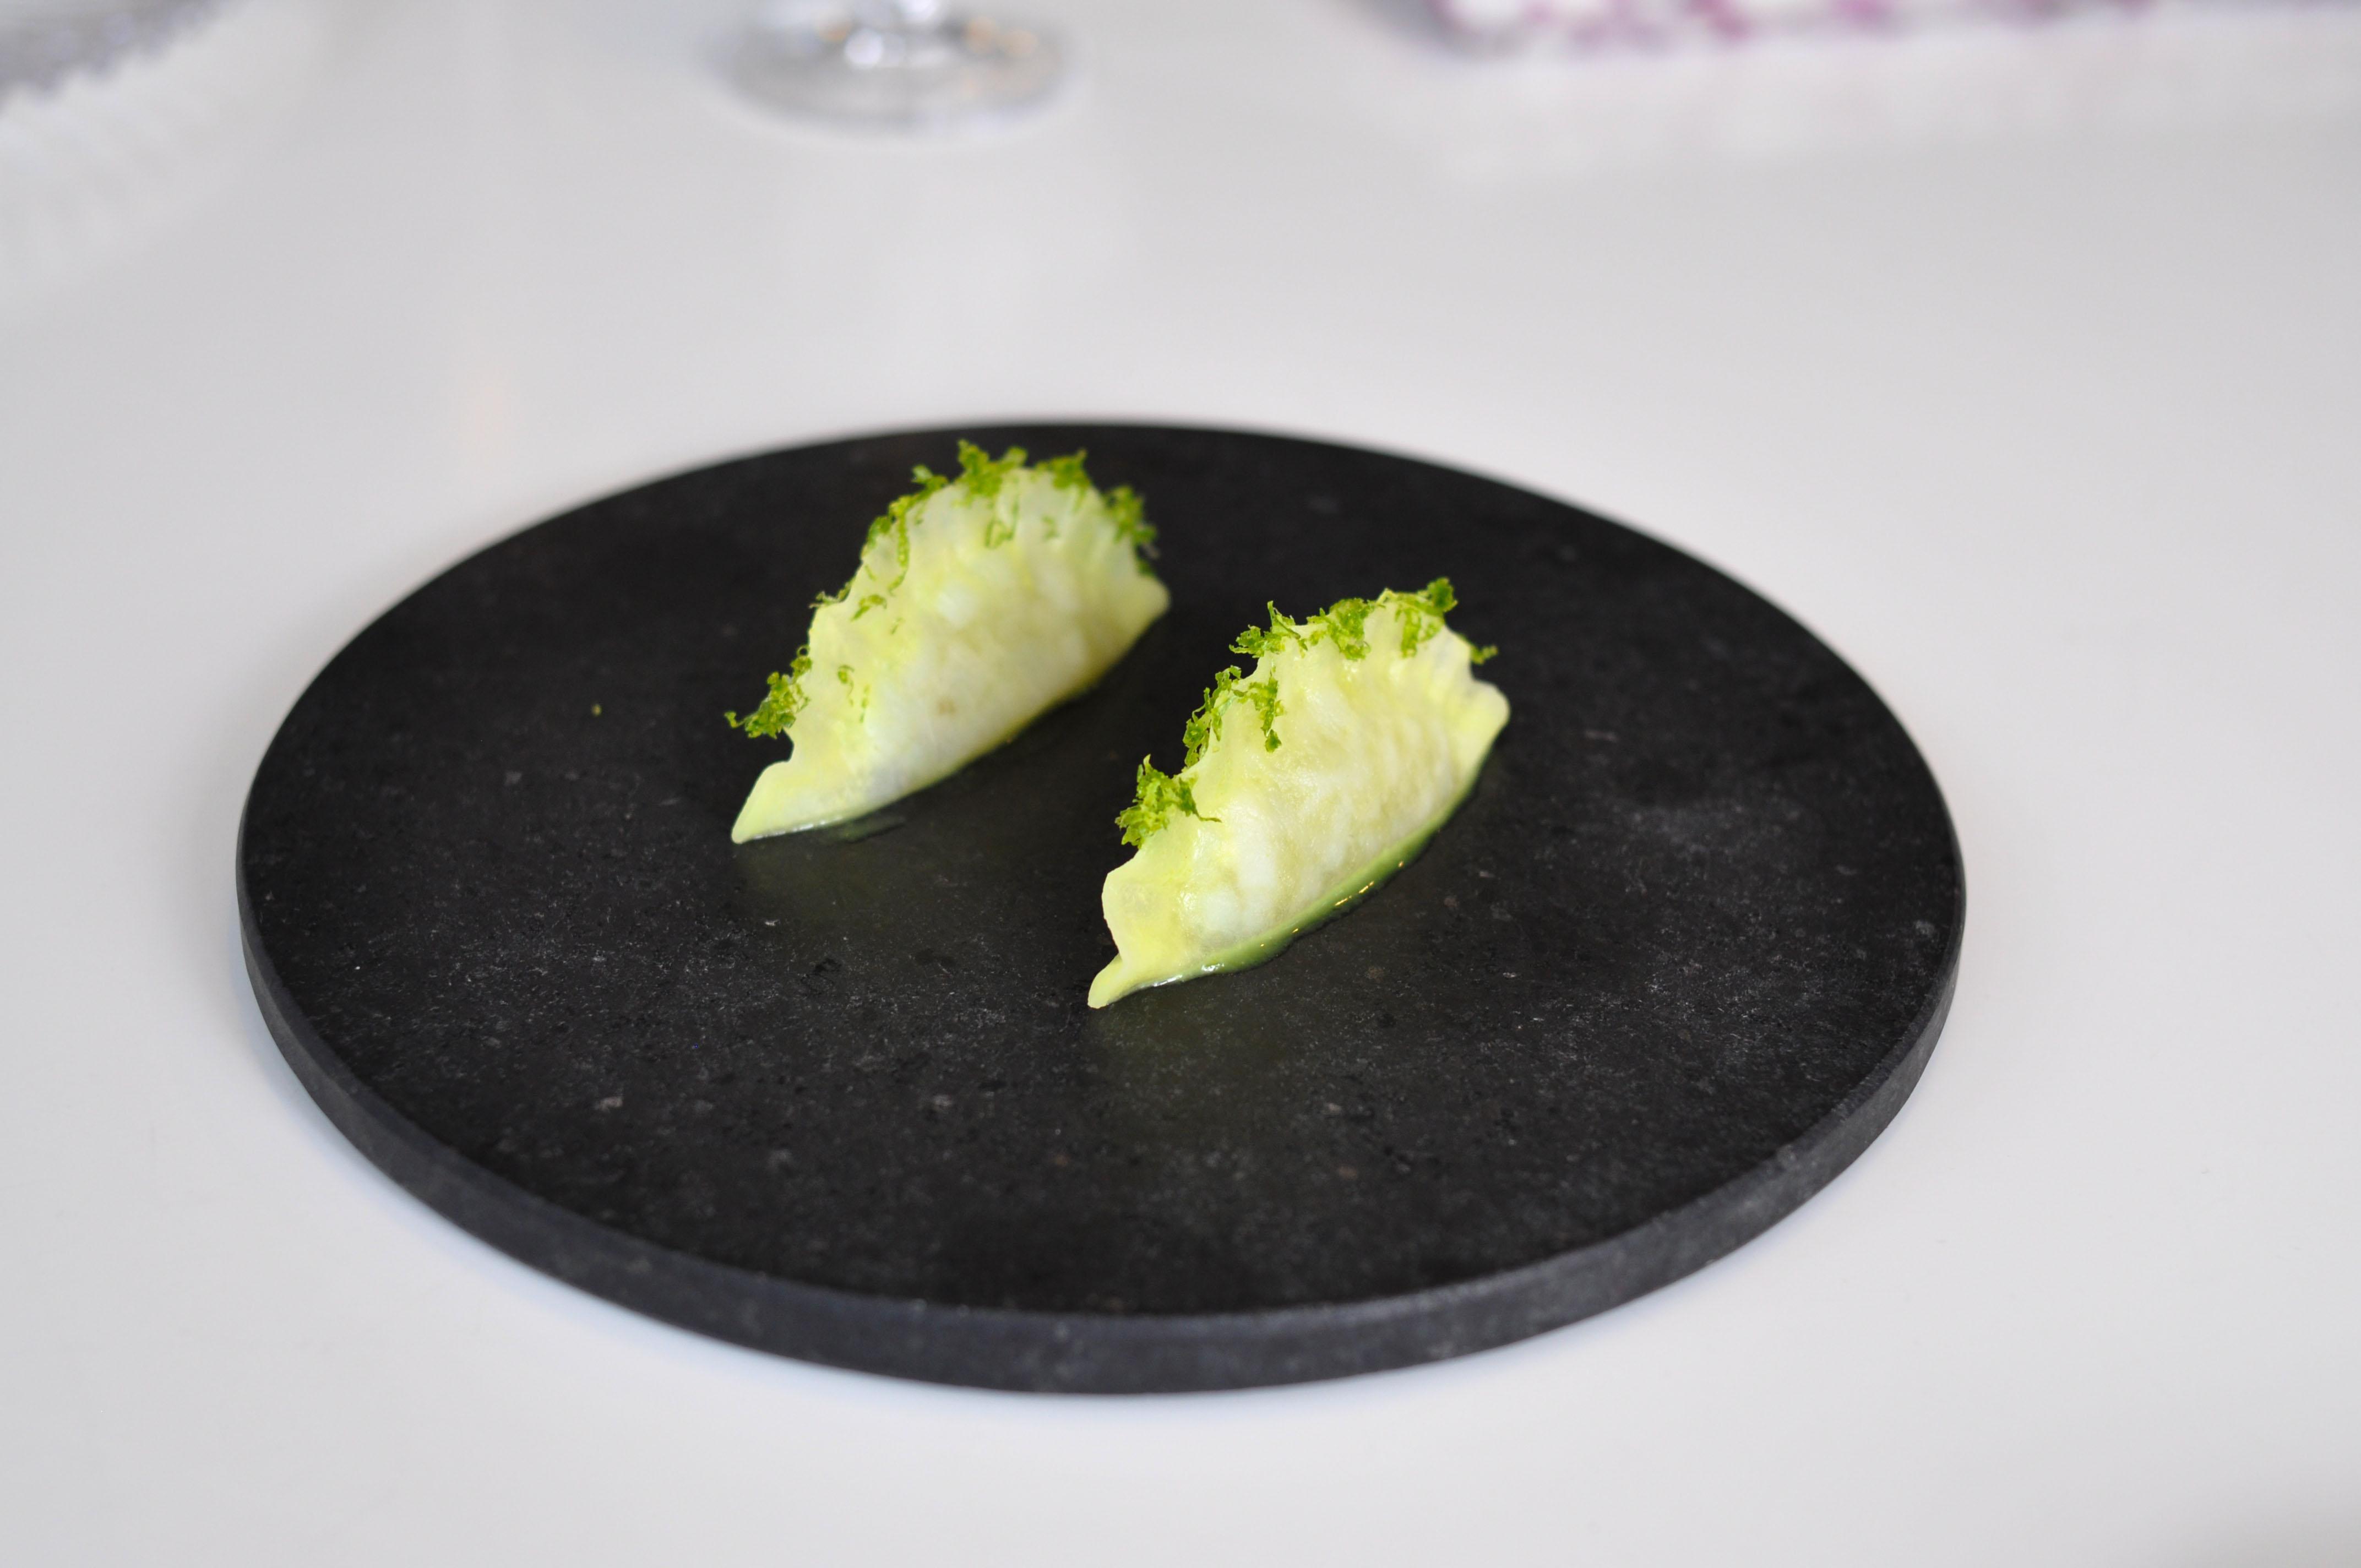 quiqiue dacosta cuttlefish turnip wasabi lime pie